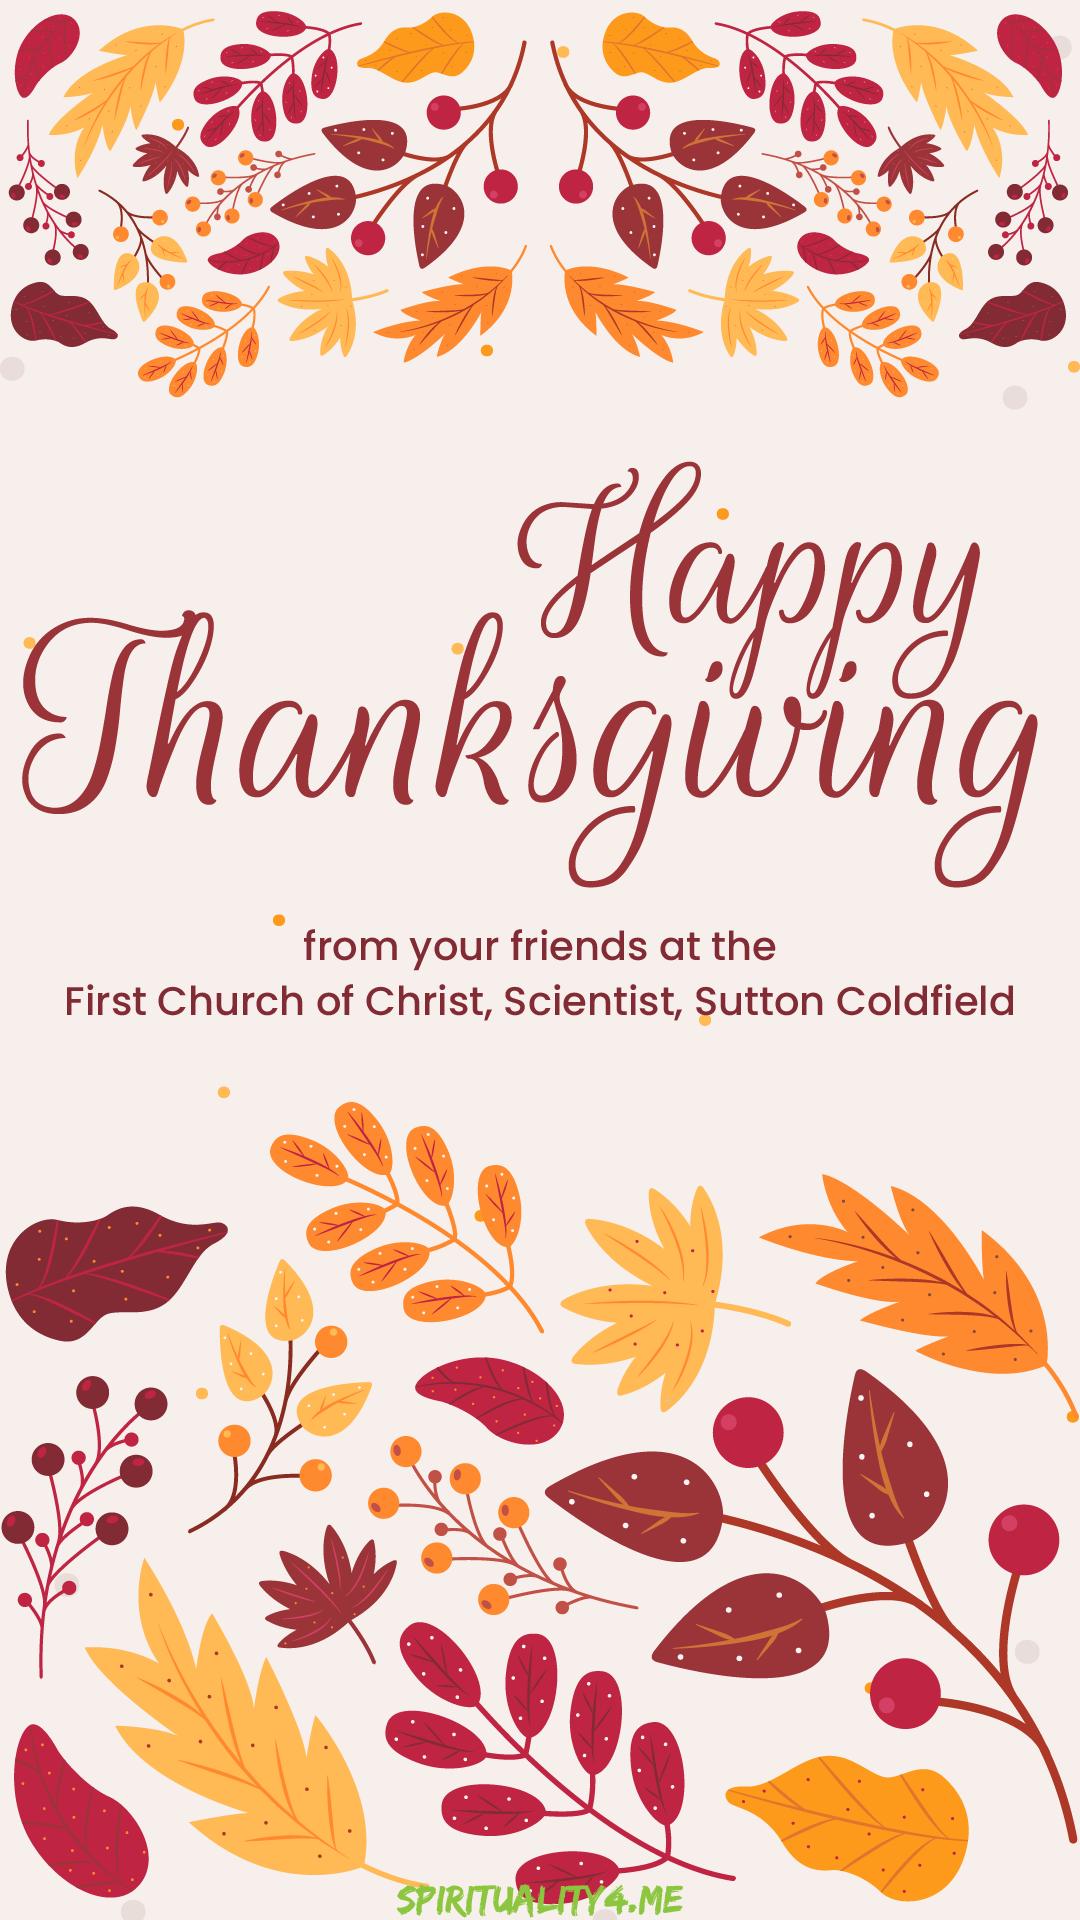 SC Thanksgiving 2019